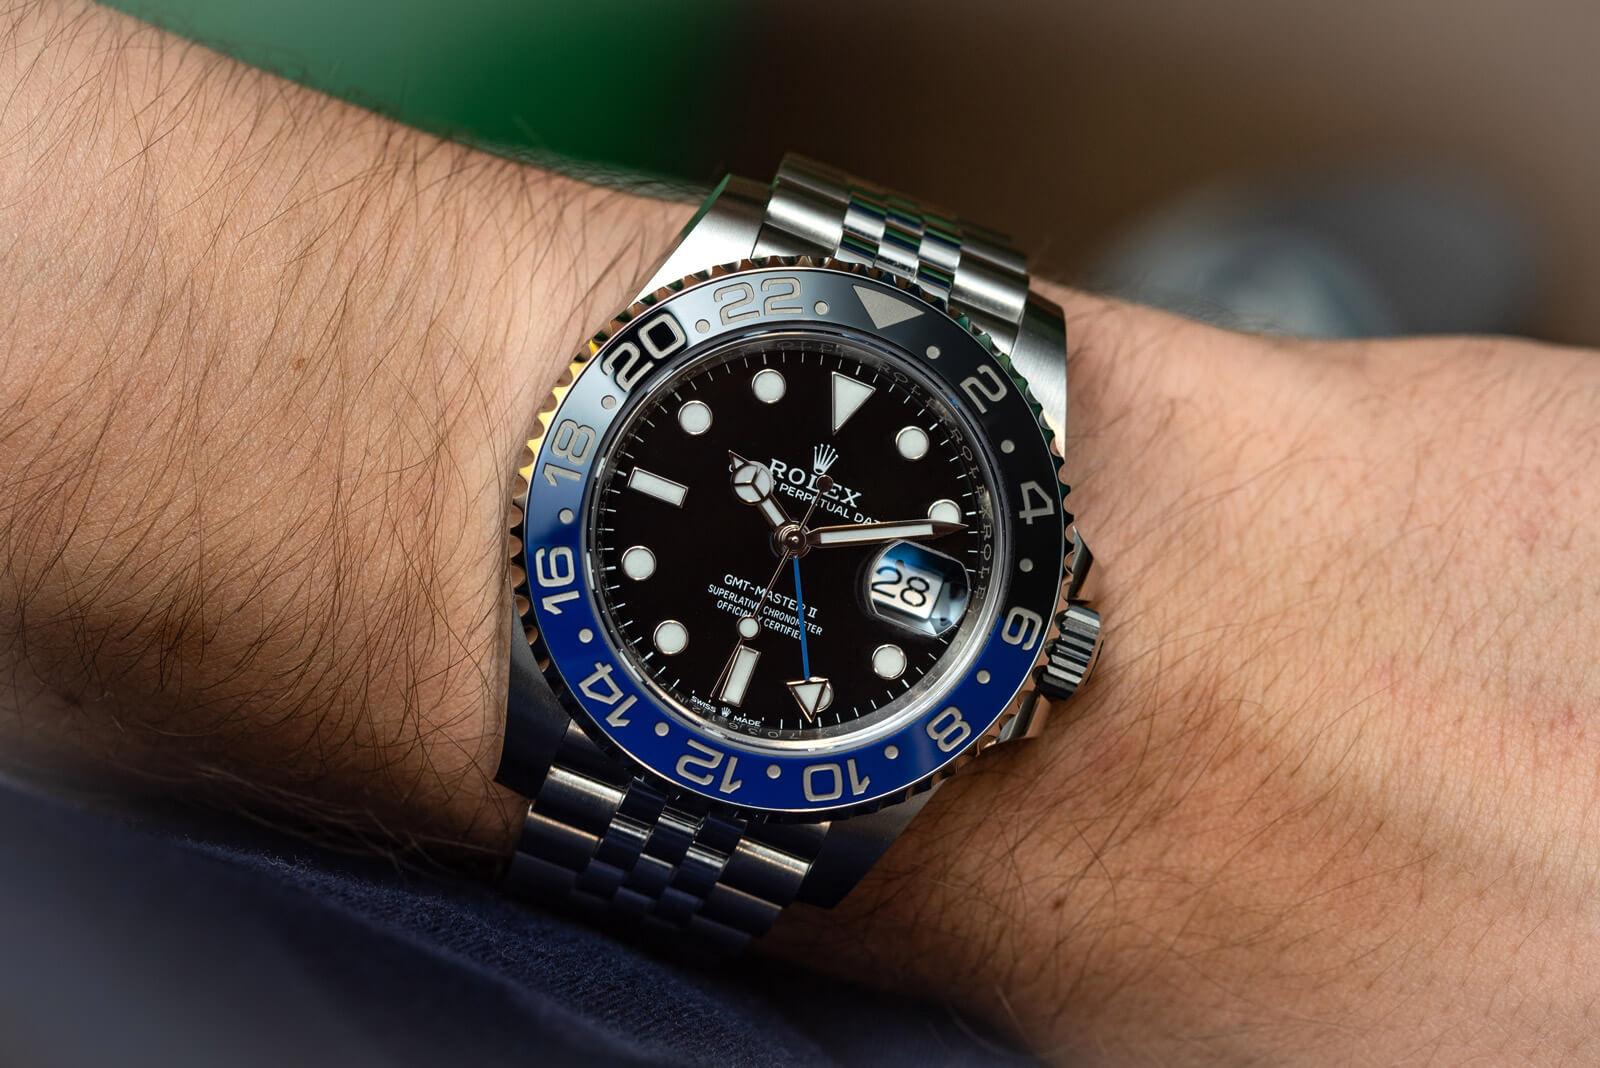 Rolex GMT-Master II – Ref. 126710BLNR